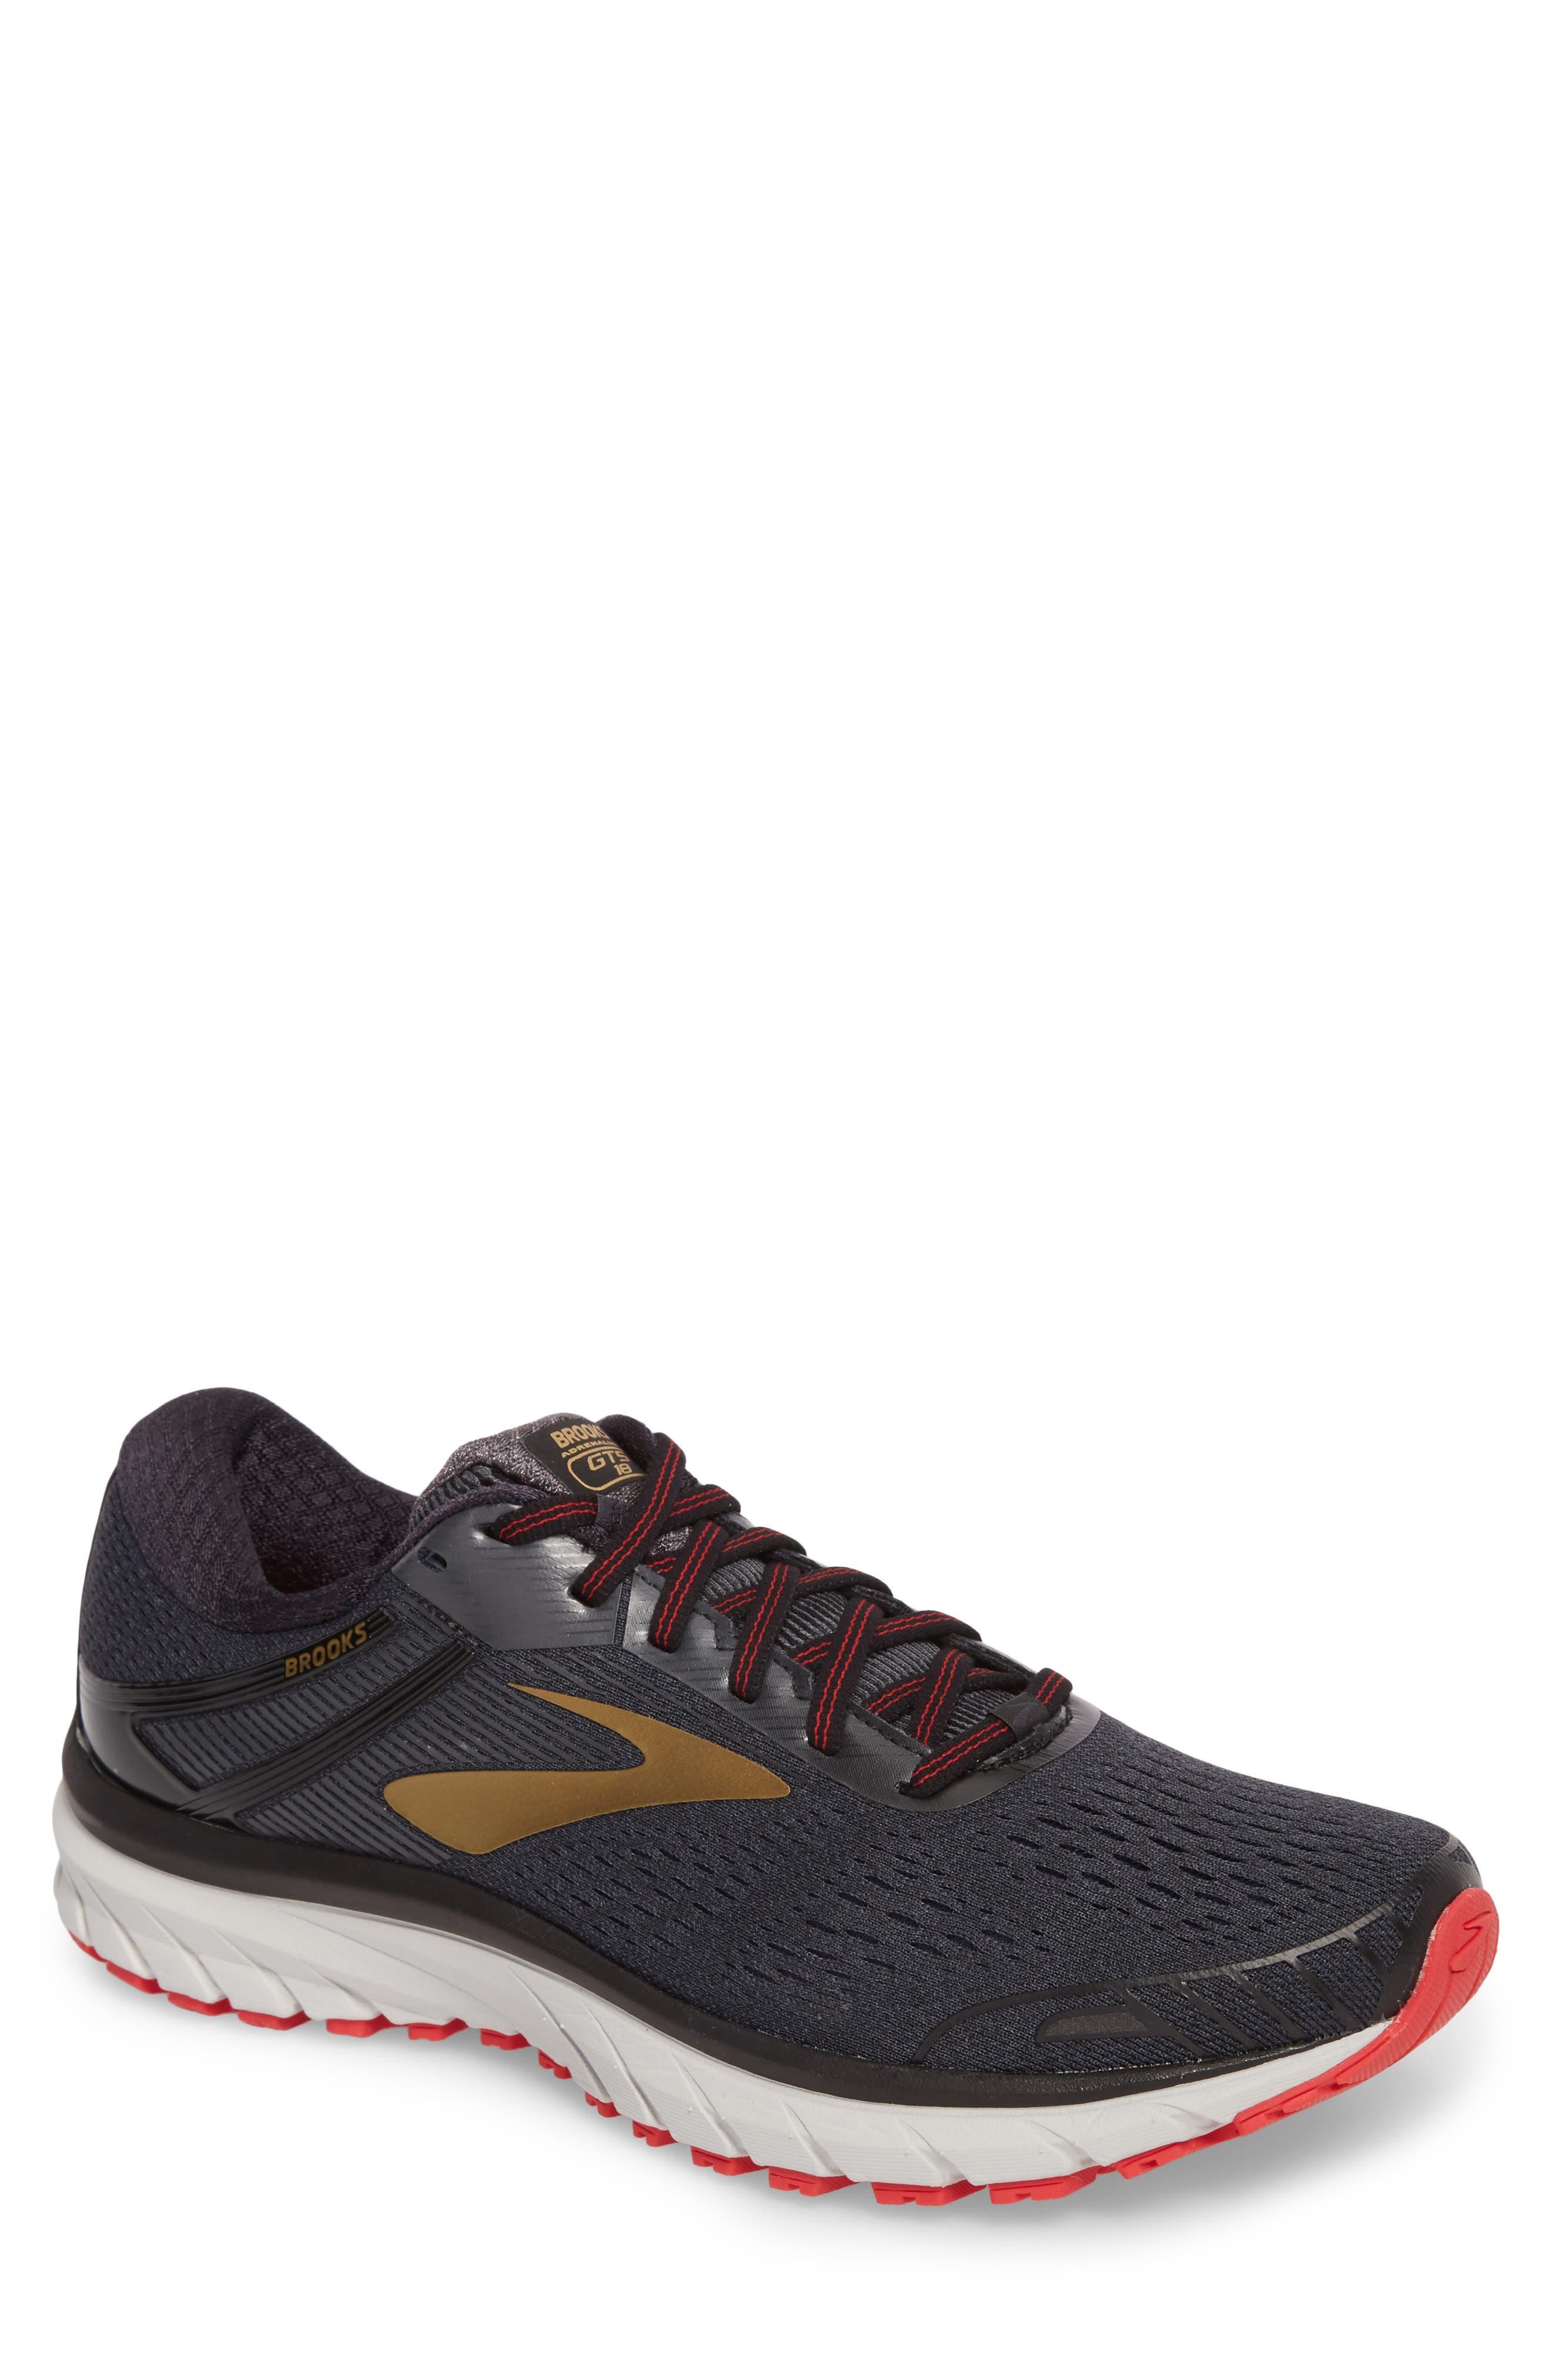 Alternate Image 1 Selected - Brooks Adrenaline GTS 18 Running Shoe (Men)